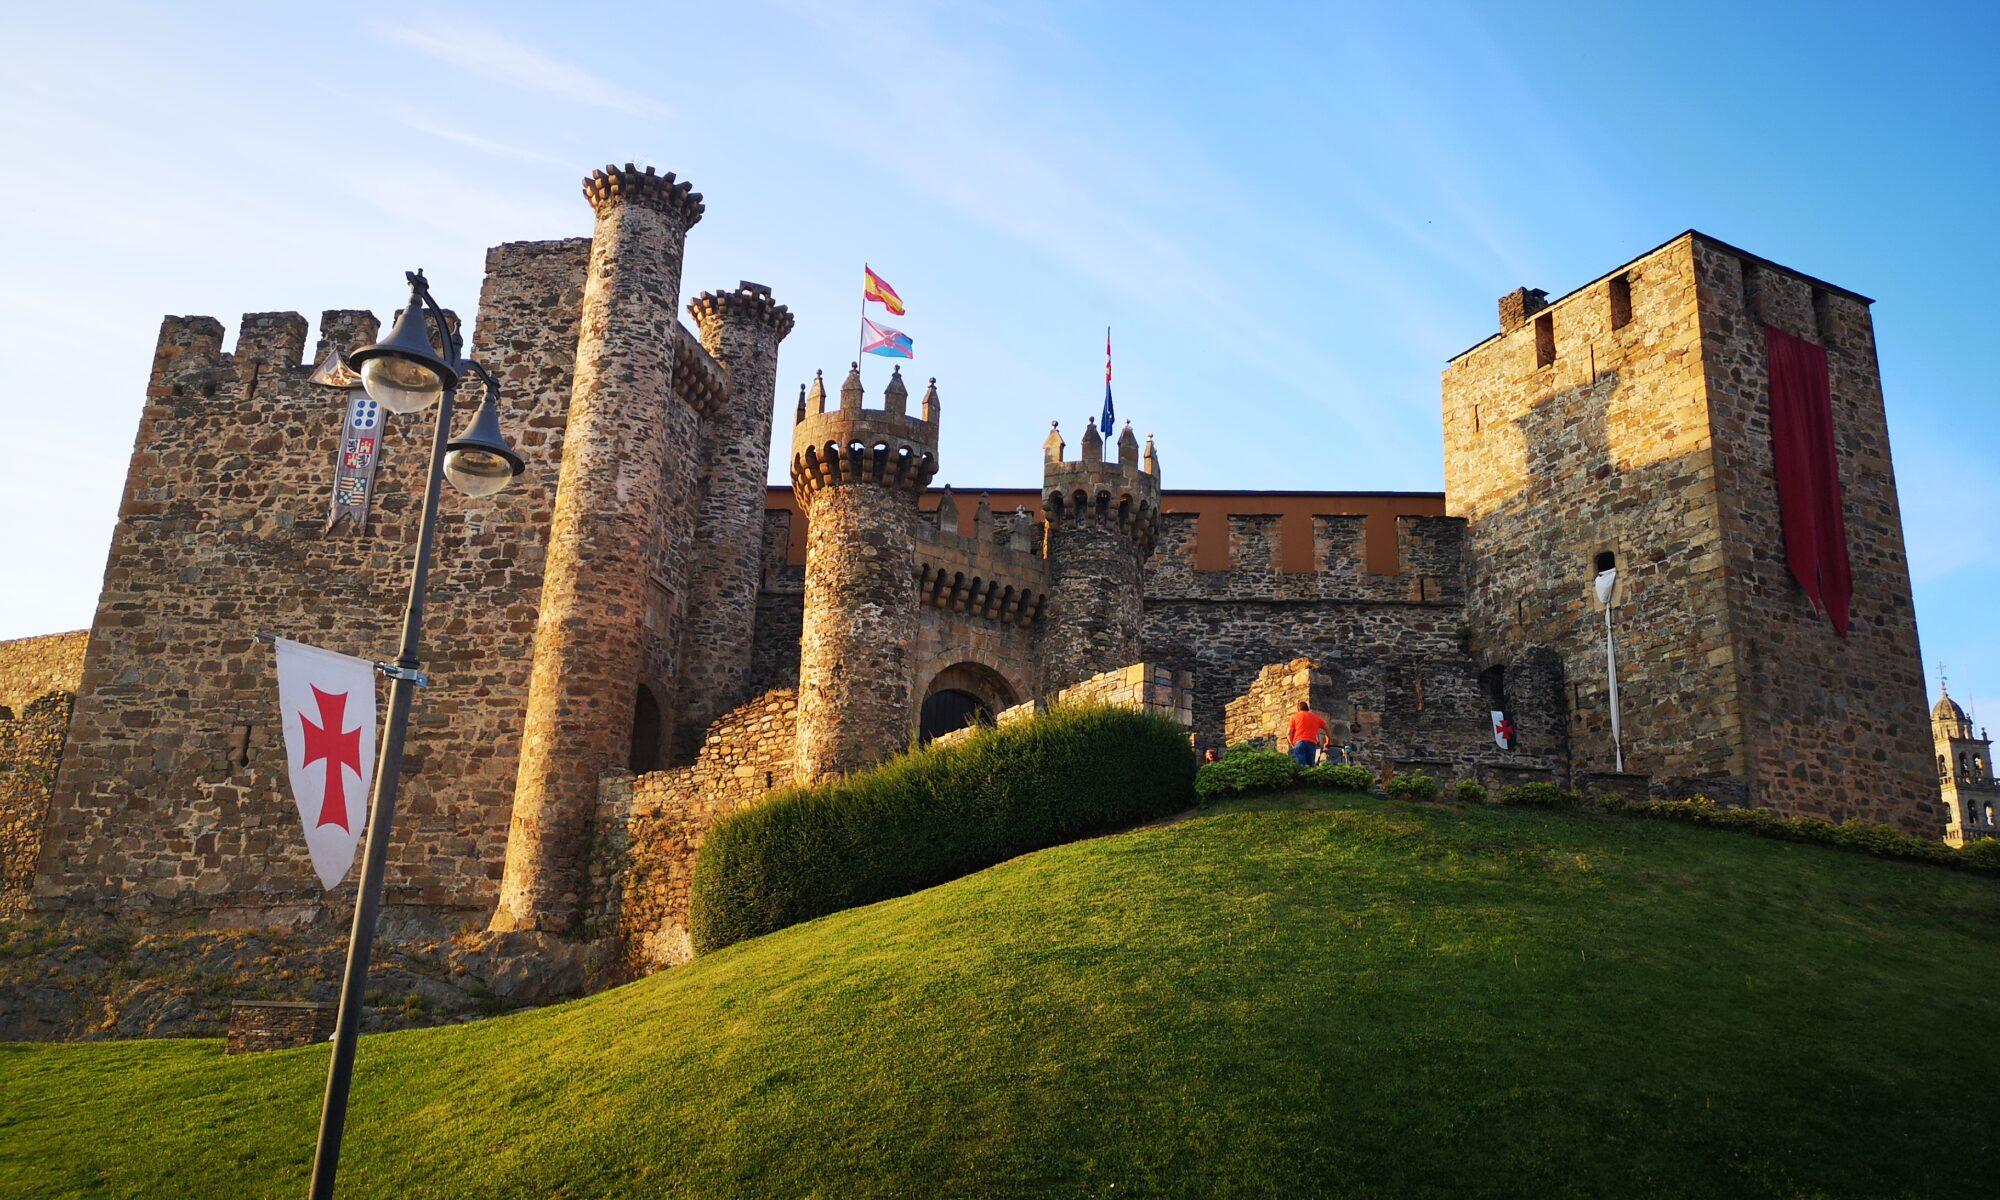 экскурсии в замки севера Испании 23